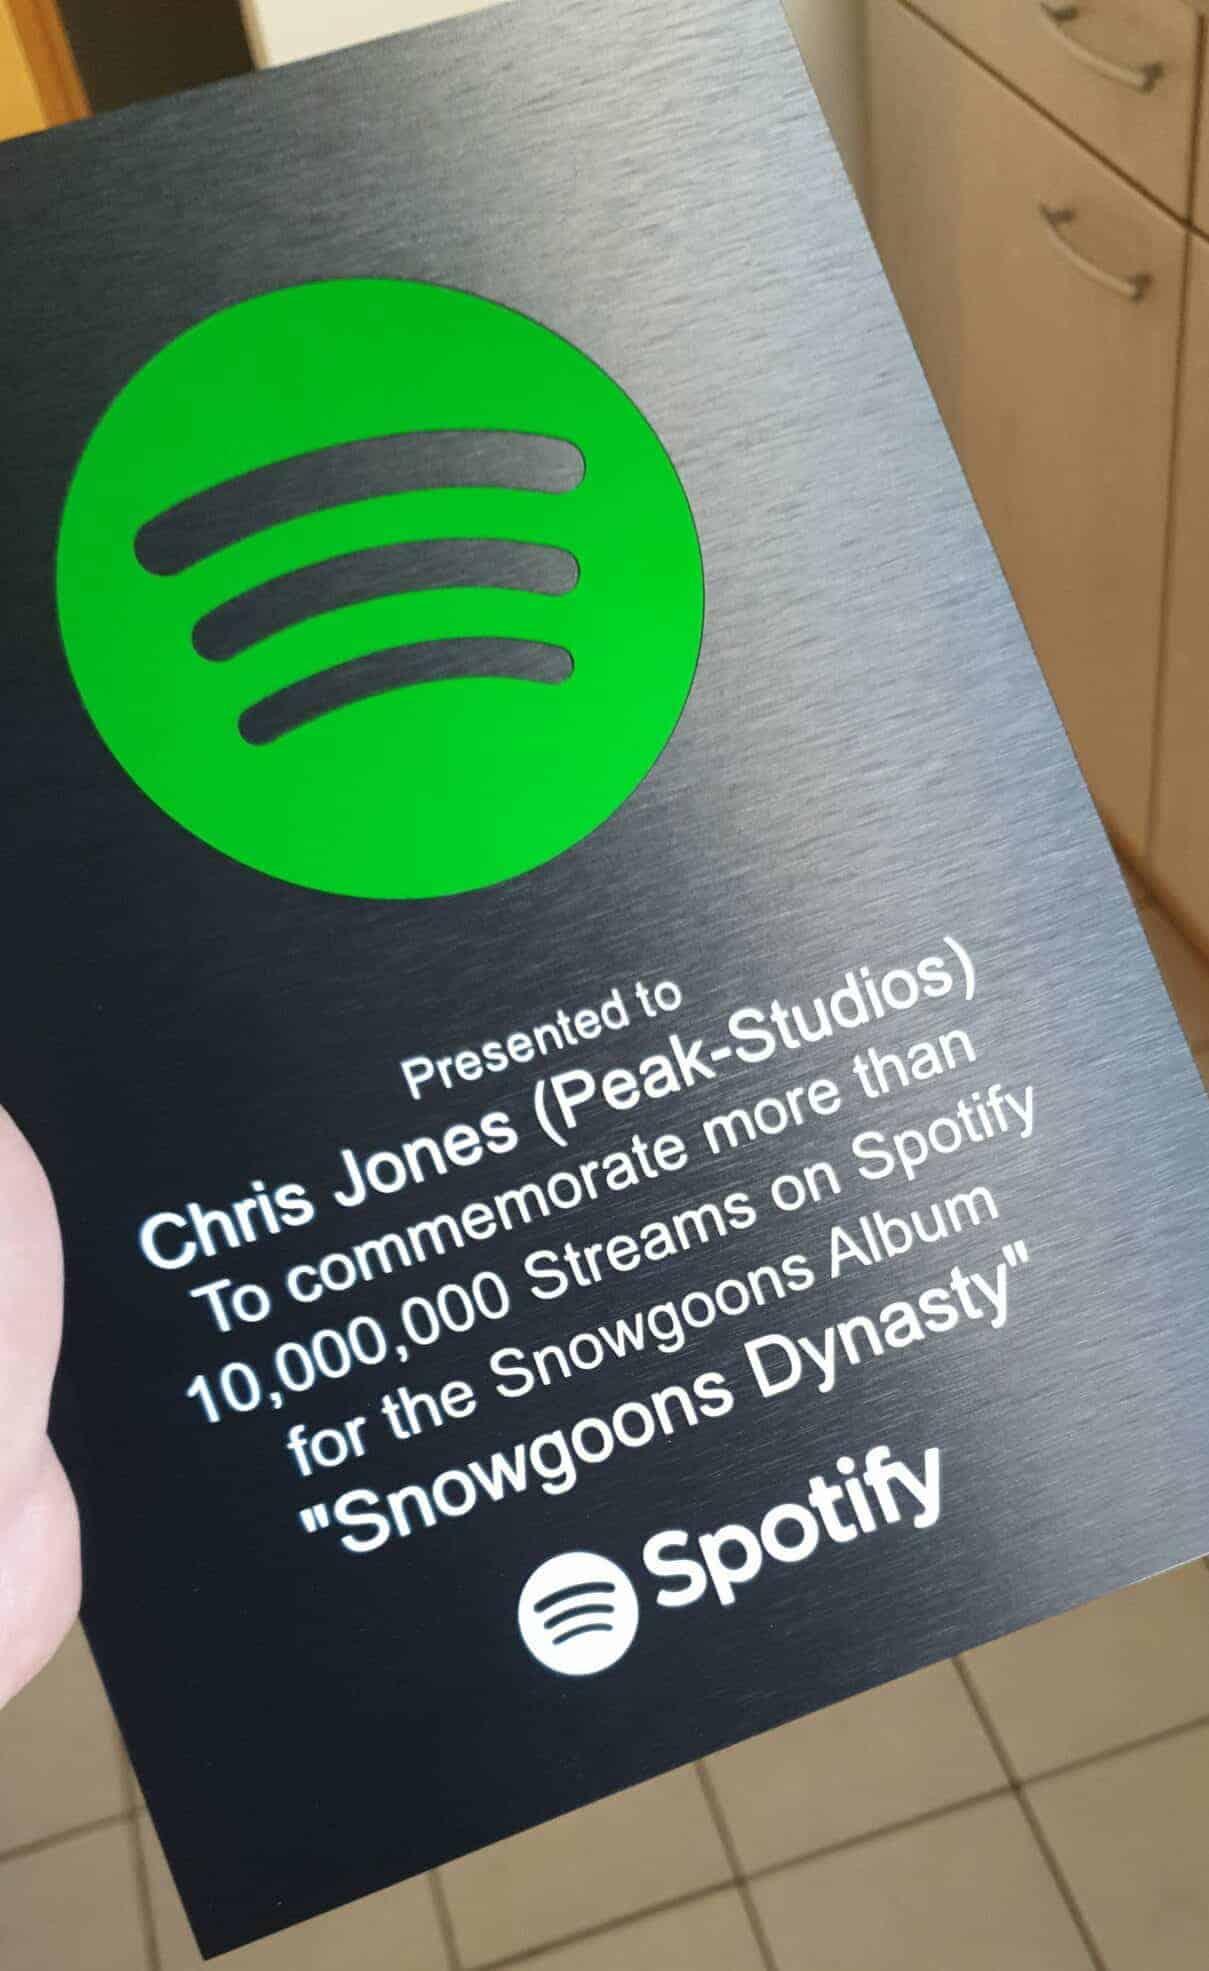 Snowgoons Dynasty Spotify Award for Chris Jones of Peak-Studios